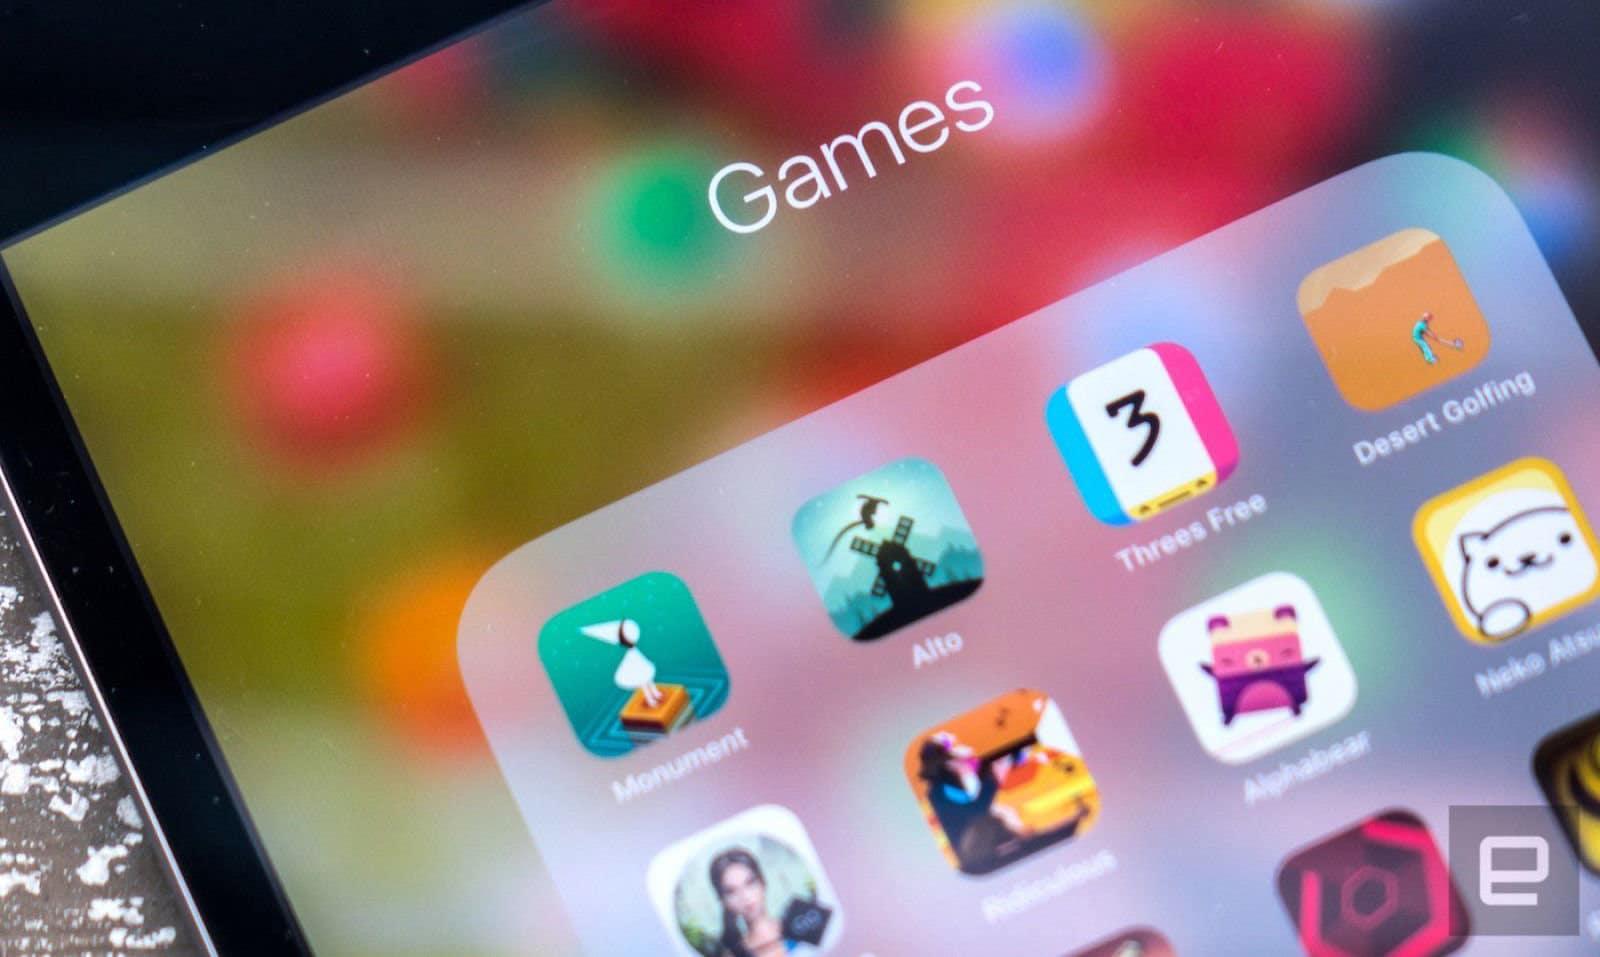 riot-games-mobil-oyunlari-100-milyon-dolarlik-gelir-barajini-asti-2